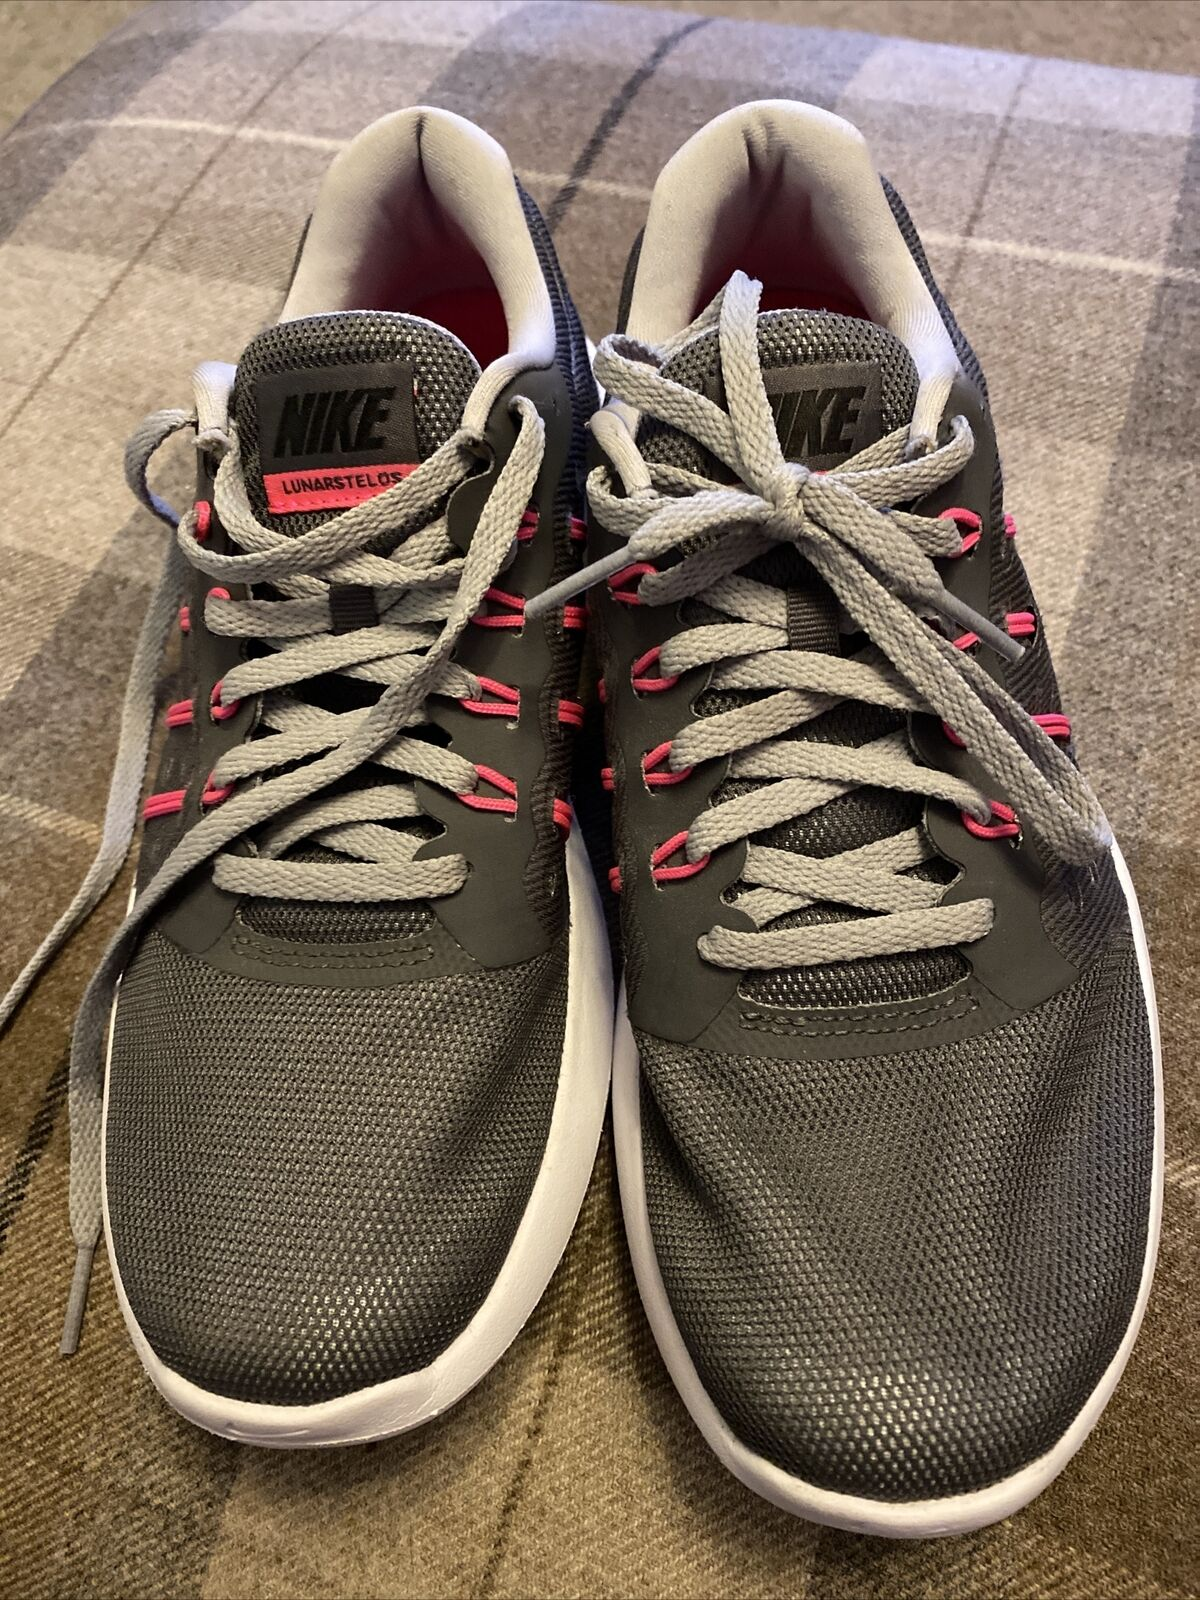 (231) Nike lunarstelos Baskets Taille 5 in (environ 12.70 cm) très bon état